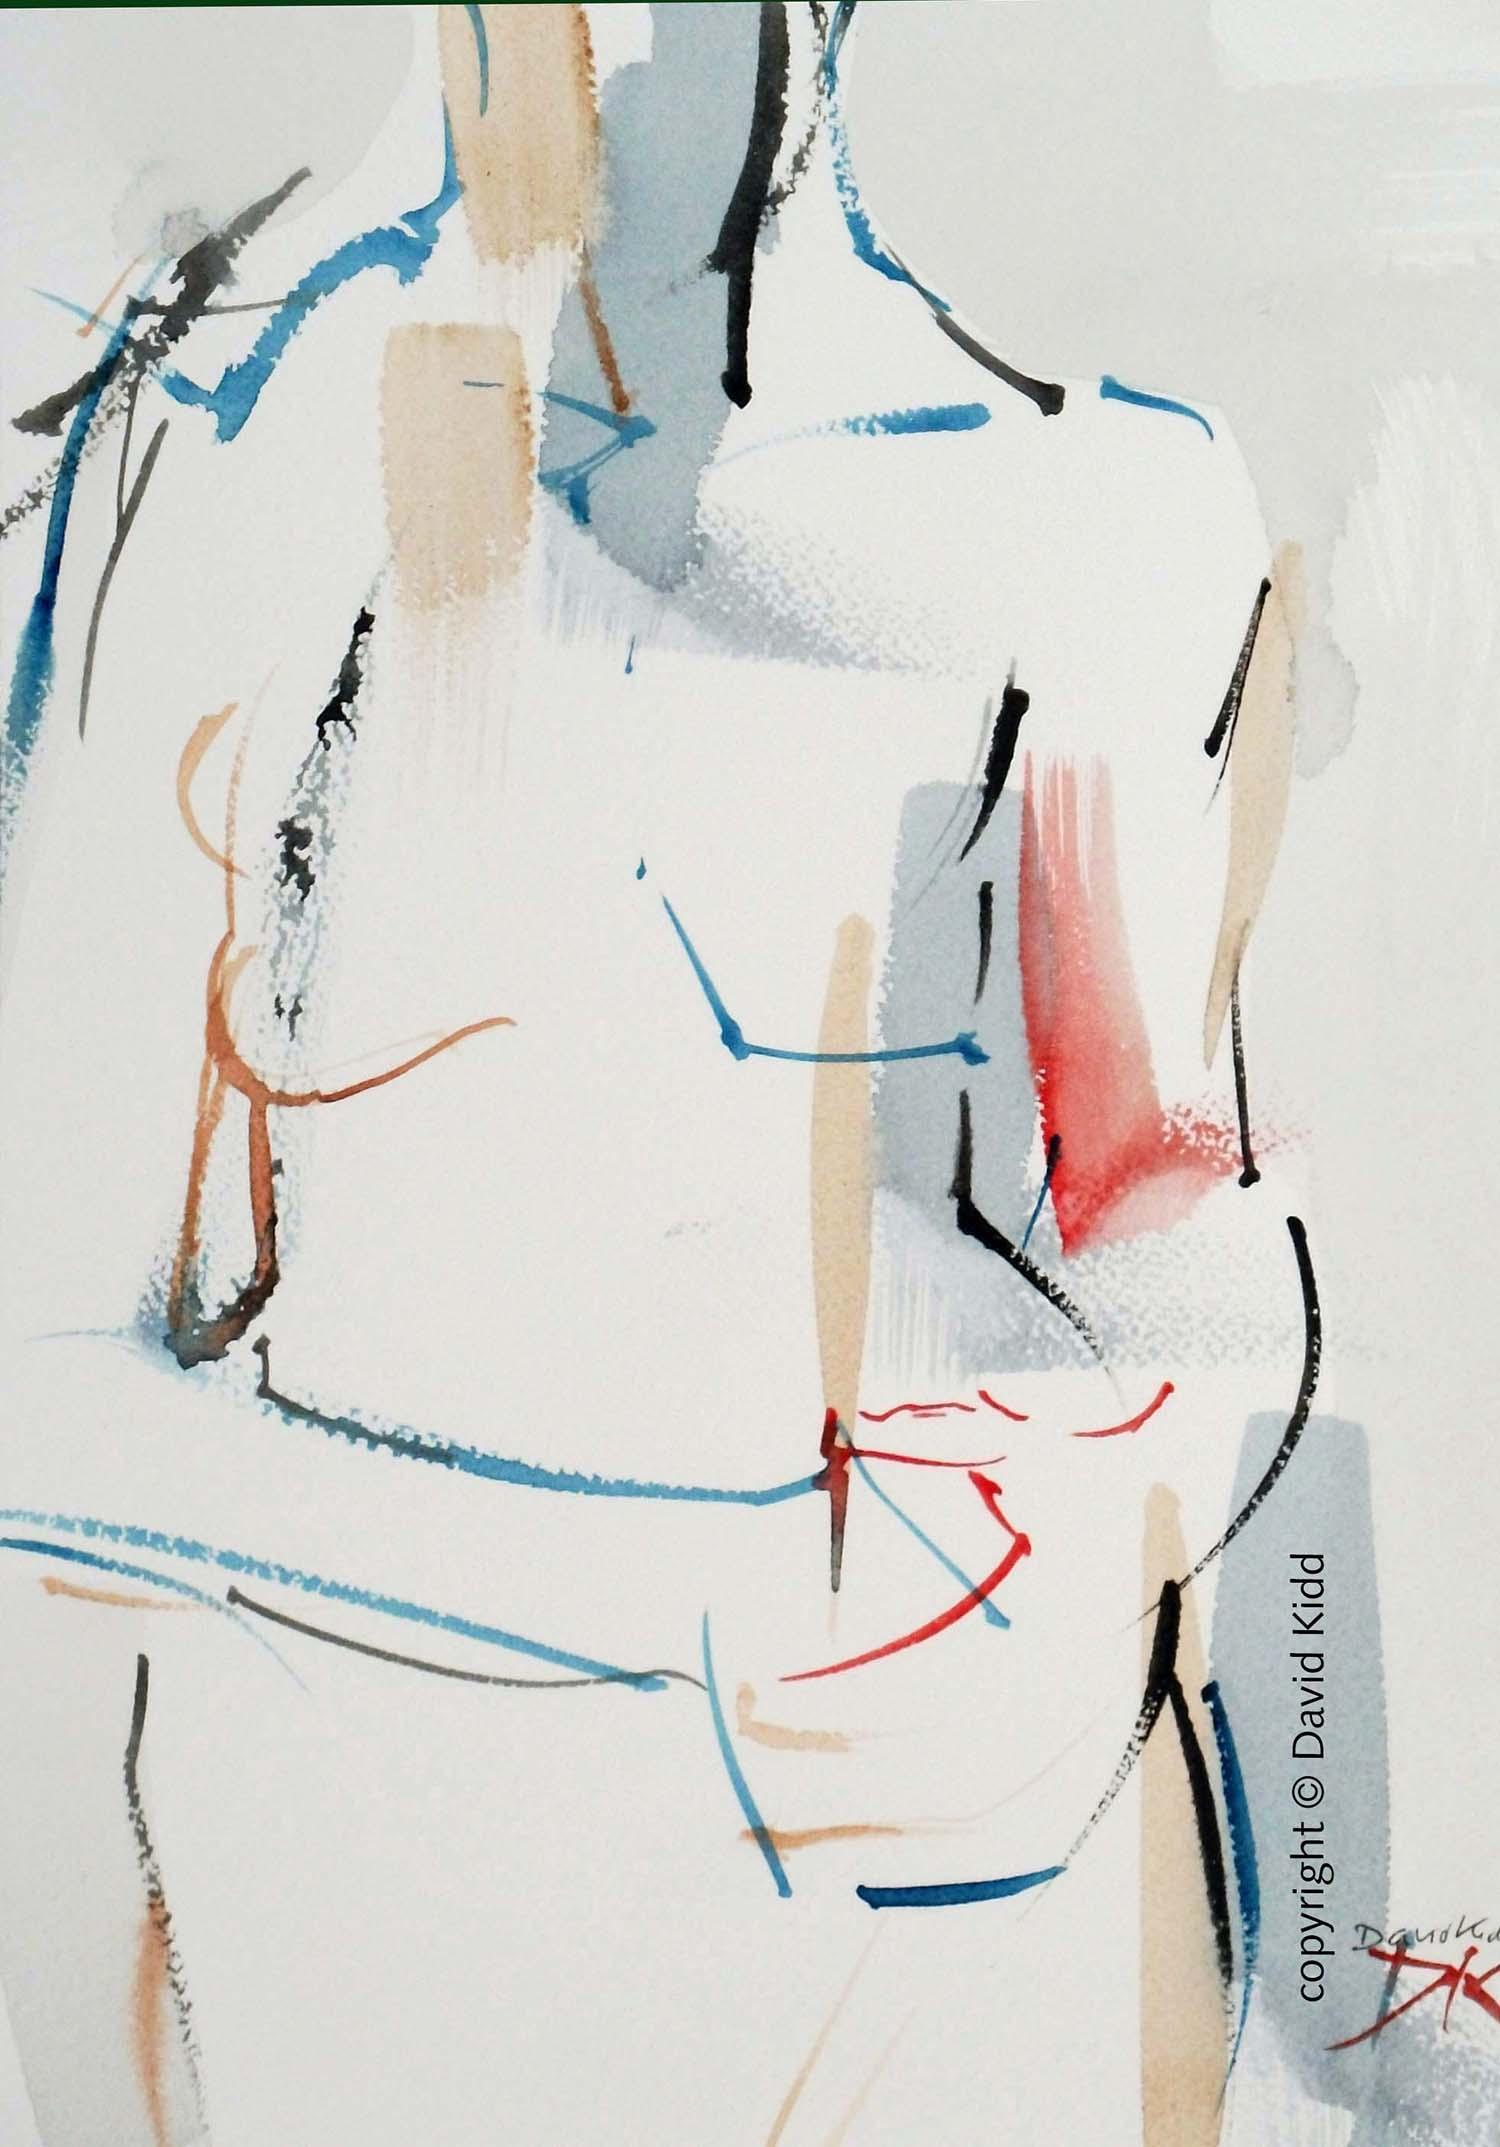 Body_Language_by_David_Kidd-1500.jpg